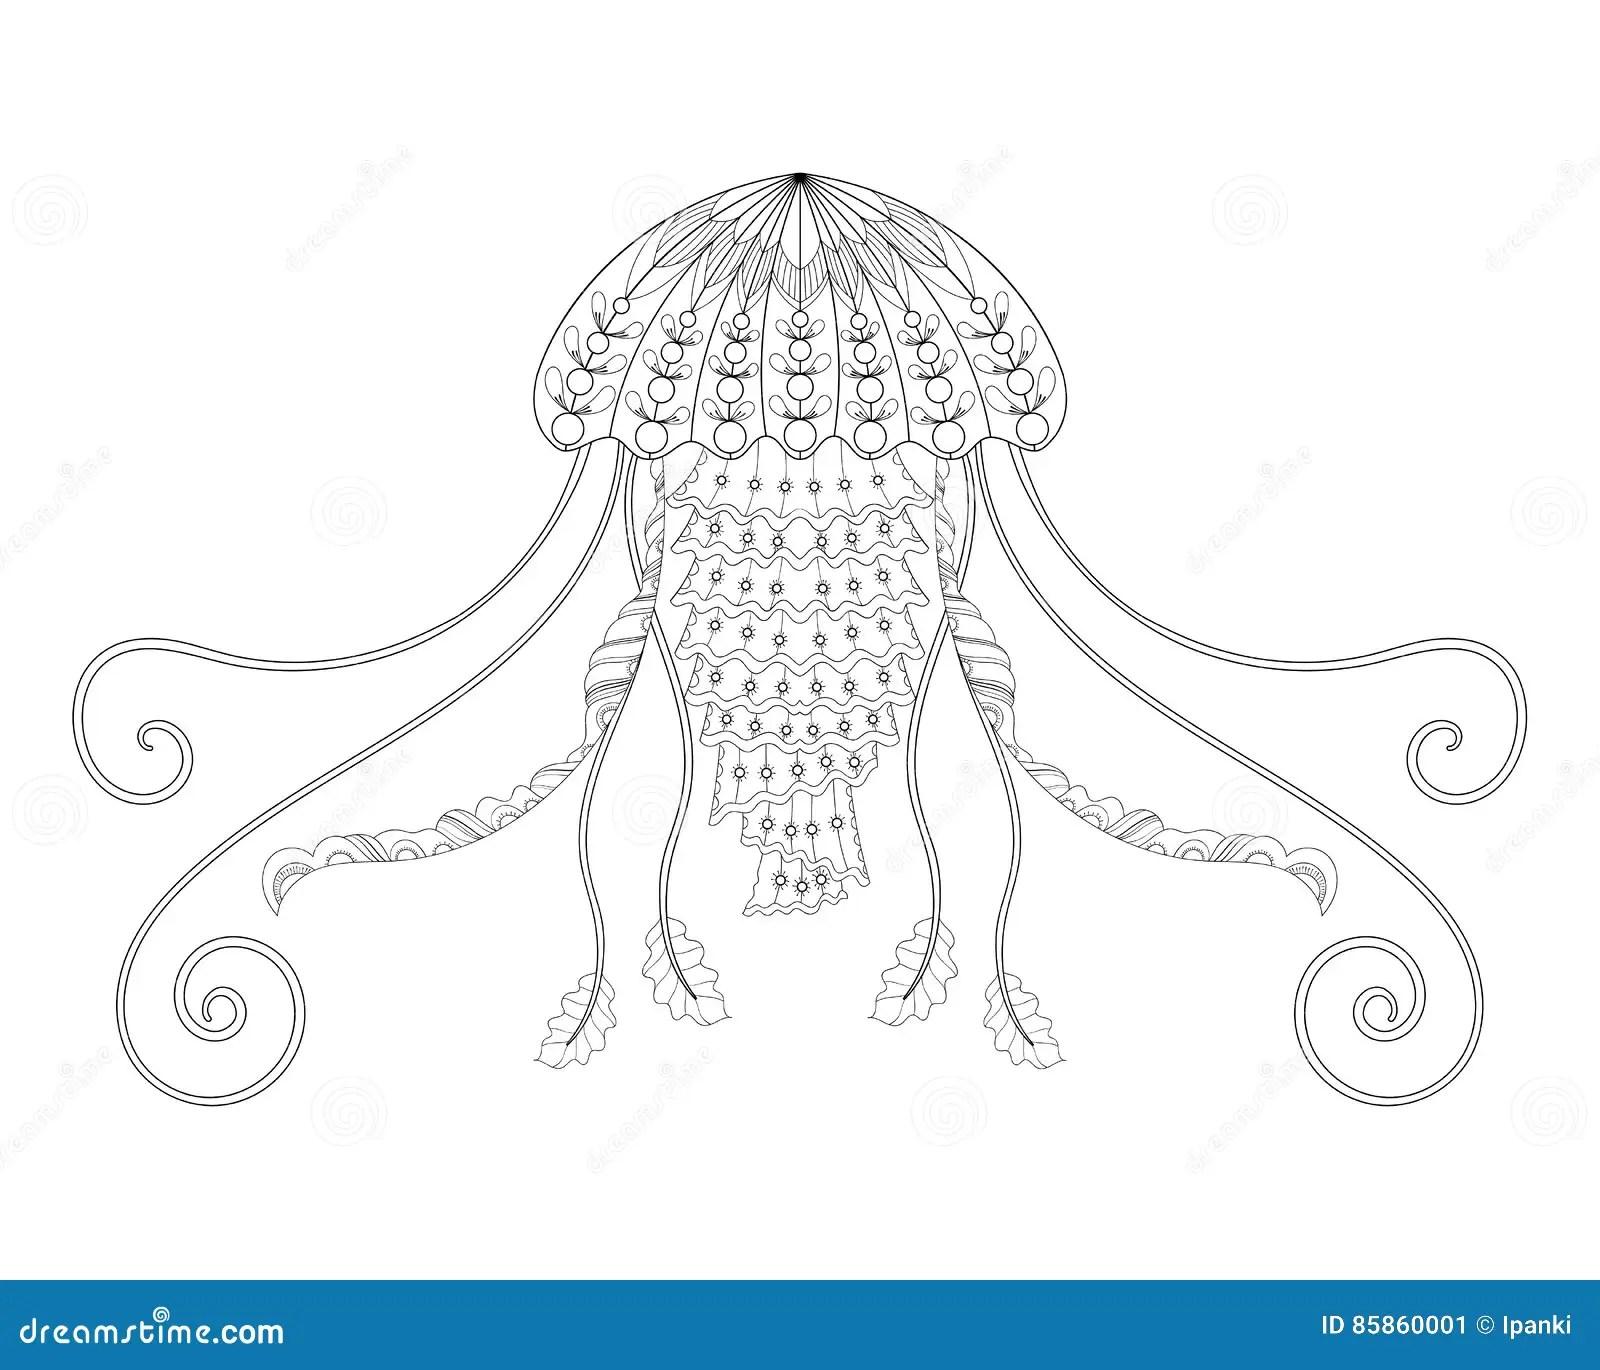 Jellyfish Vector Illustration Hand Drawn Sea Animal For